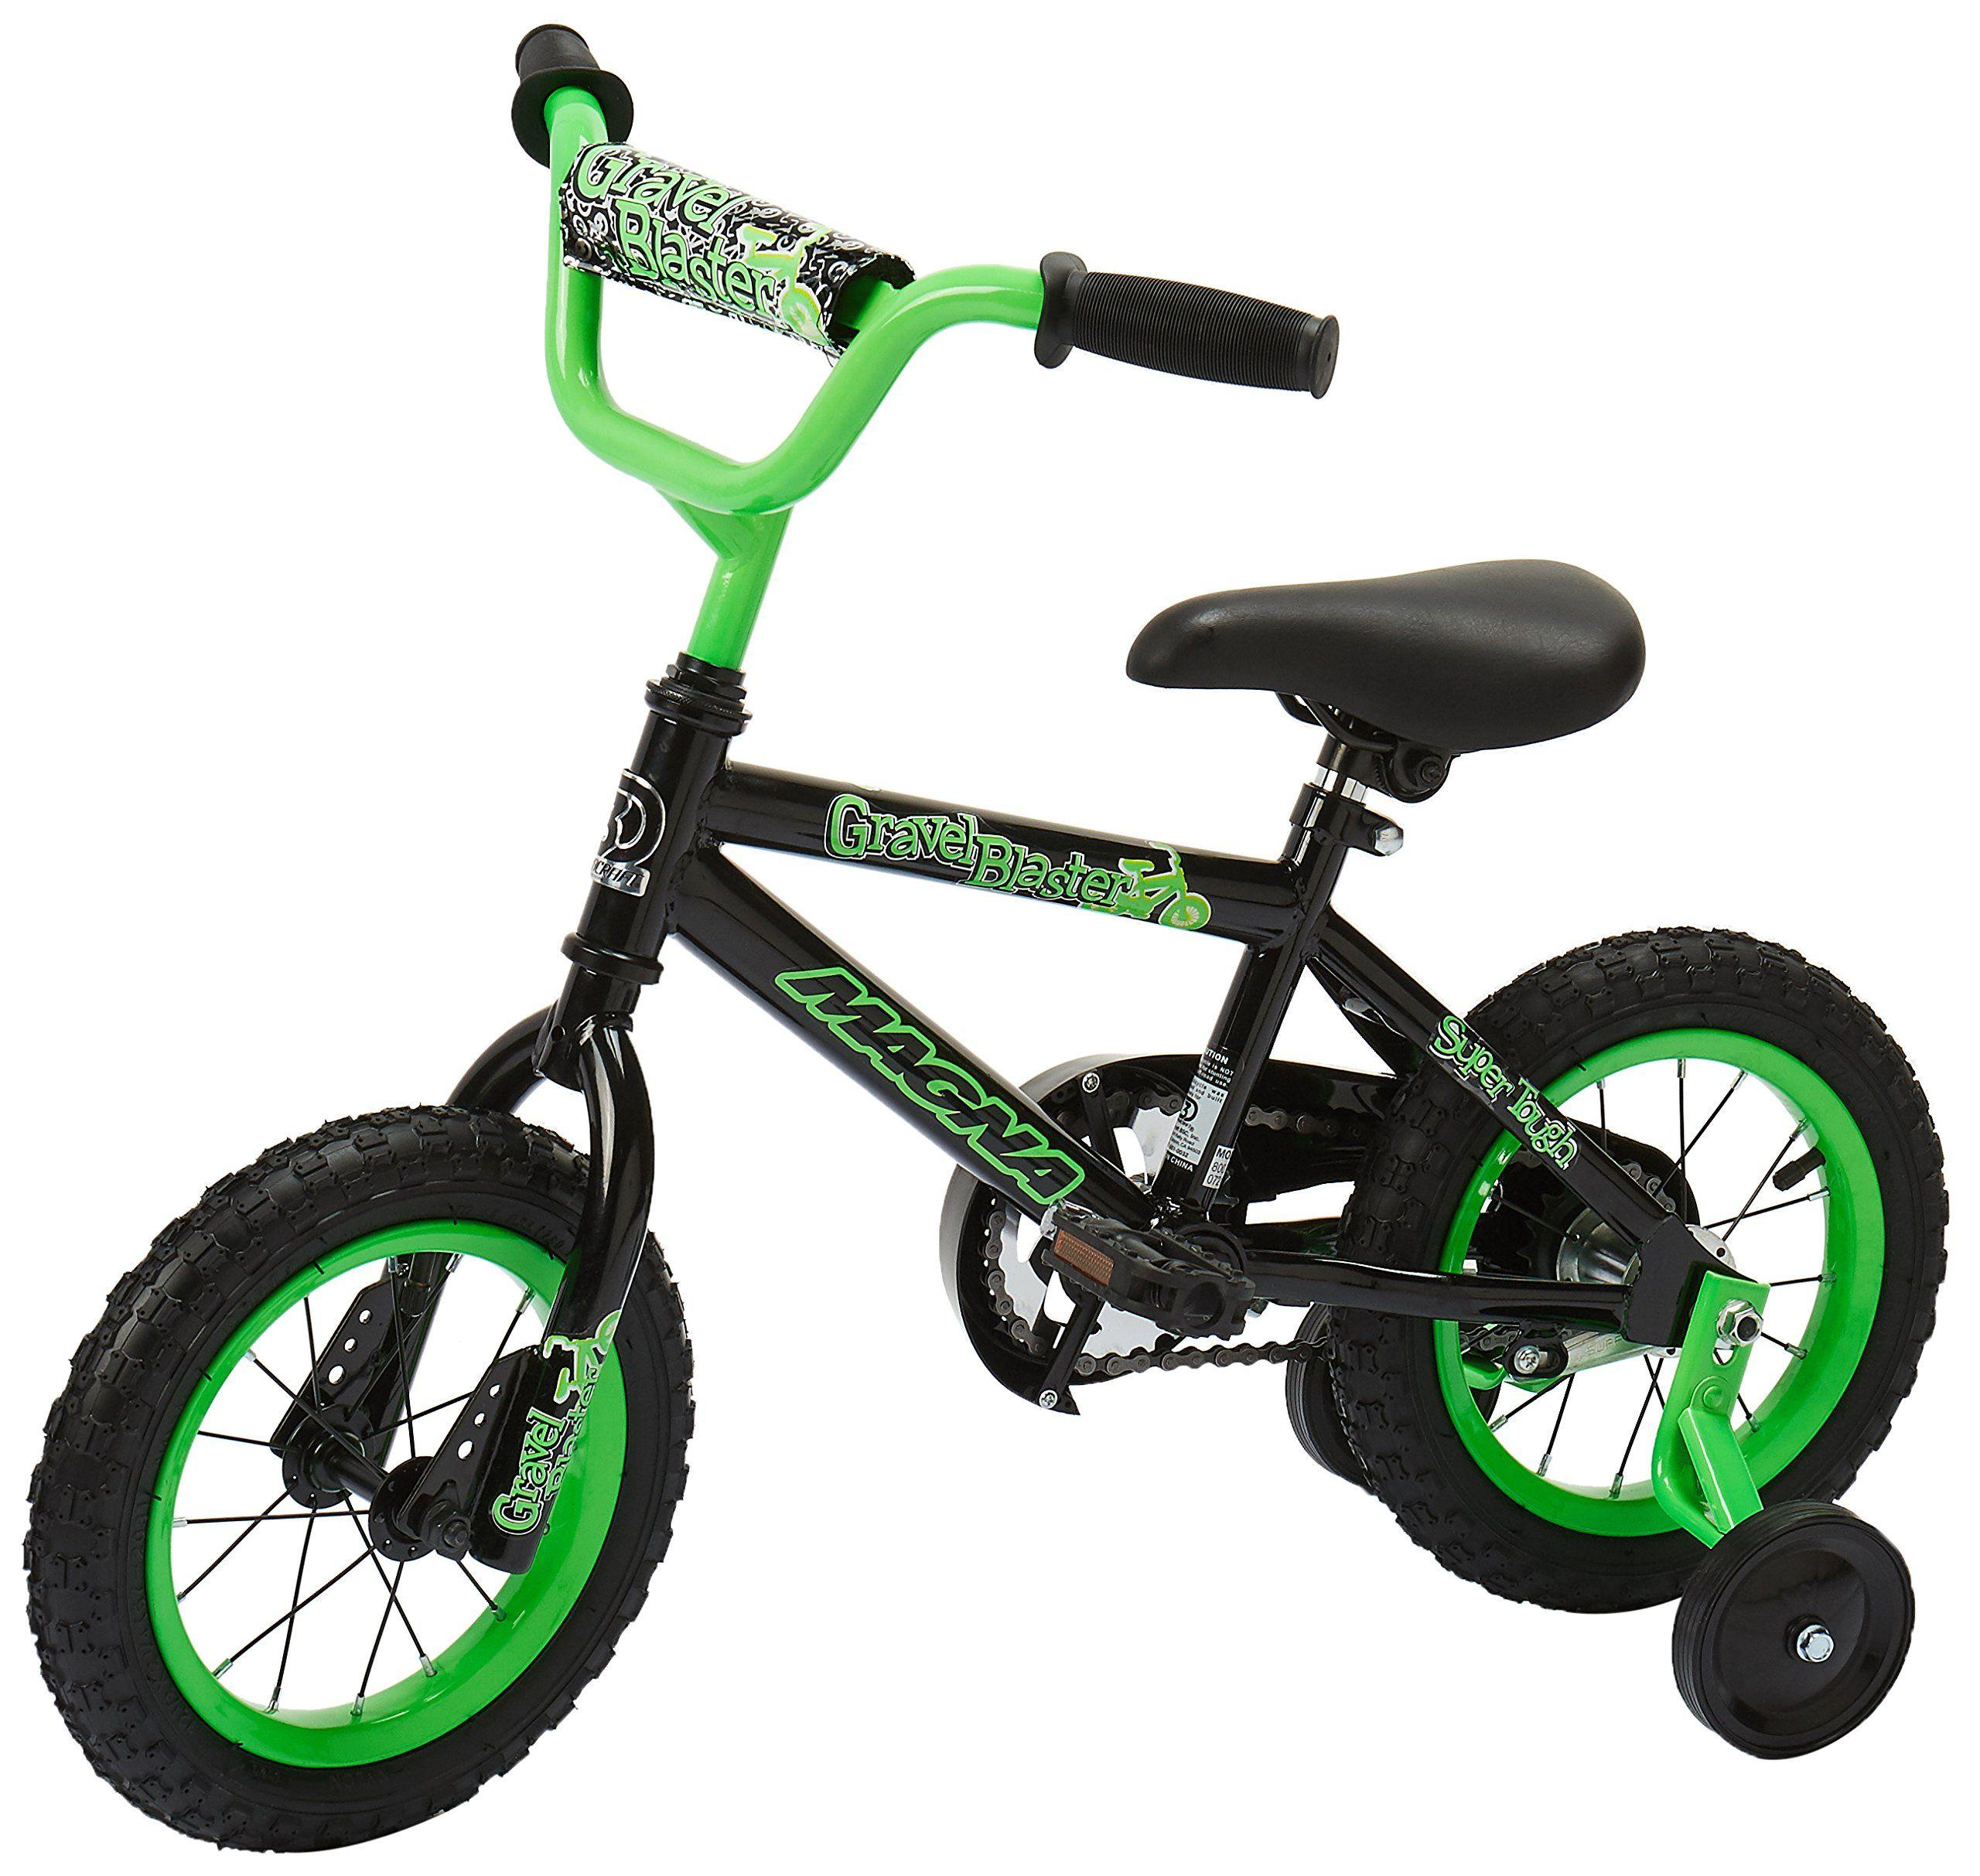 Dynacraft Magna Gravel Blaster Boys Bmx Street Dirt Bike 12 Black